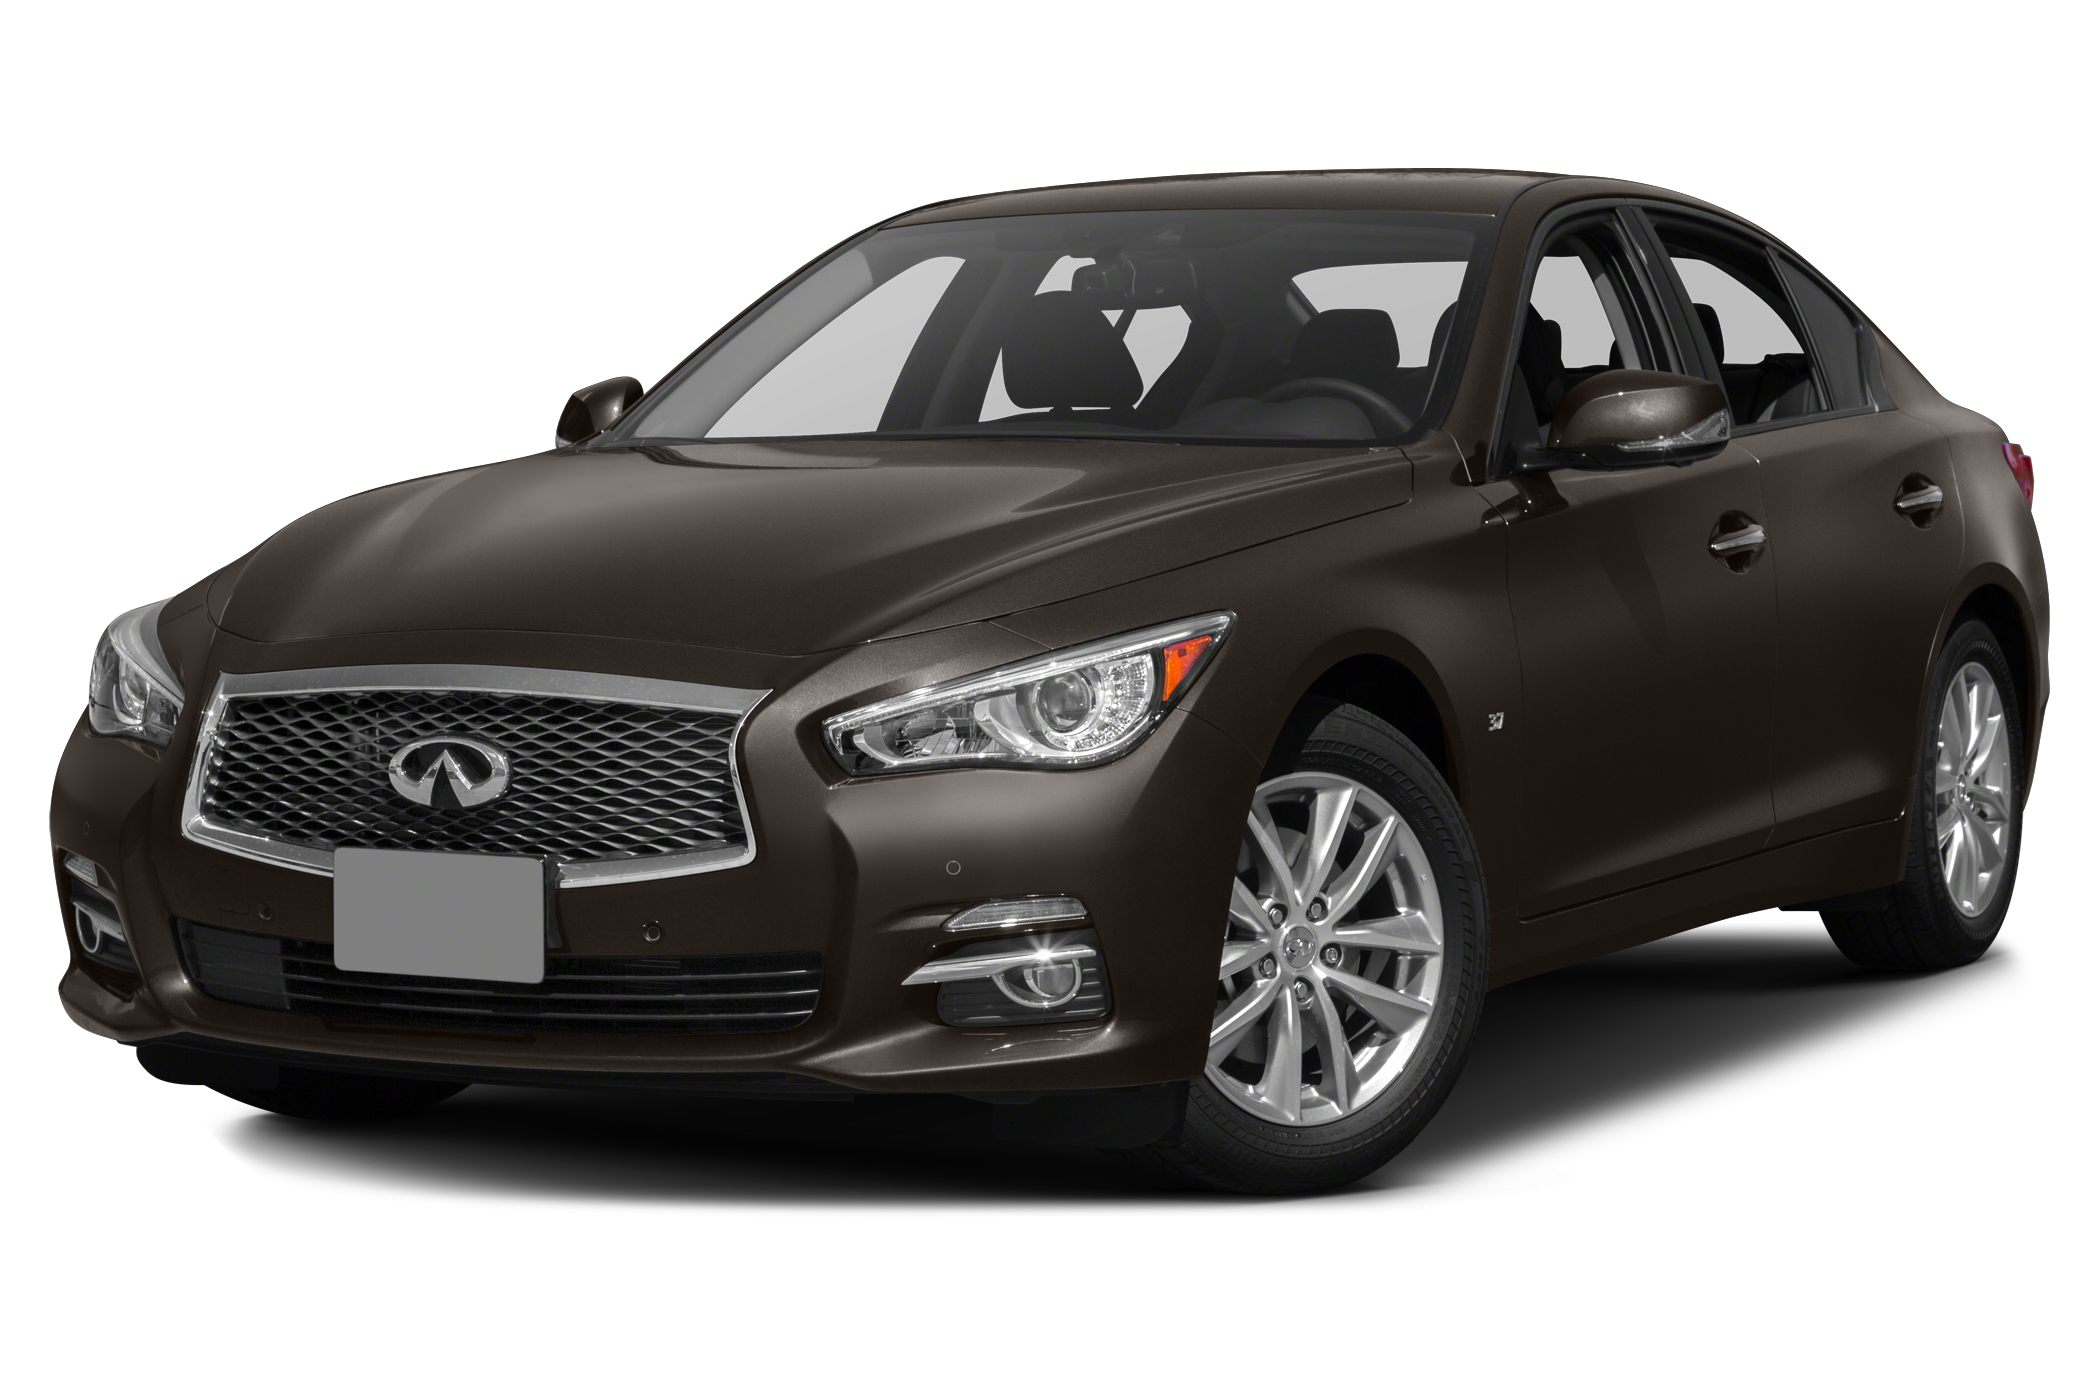 2015 INFINITI Q50 Sport 4dr All wheel Drive Sedan Specs and Prices